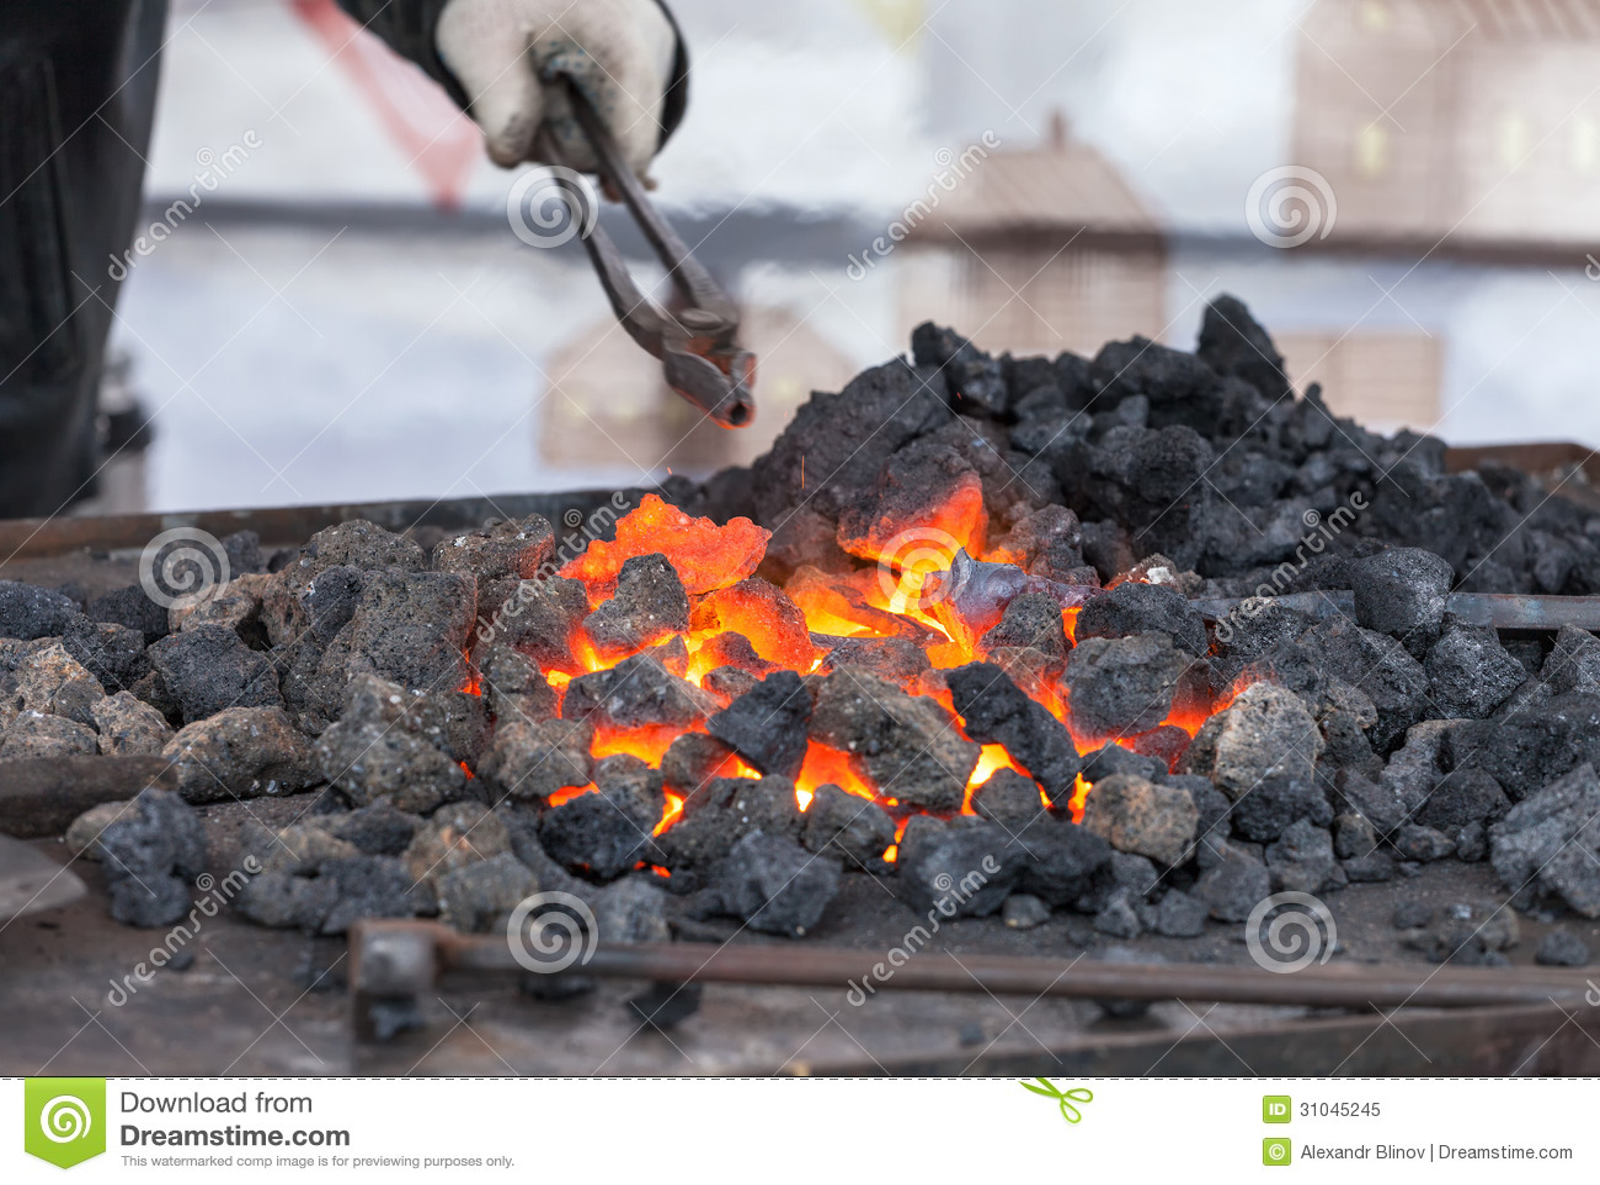 Fogo da forja no ferreiro onde ferramentas do ferro